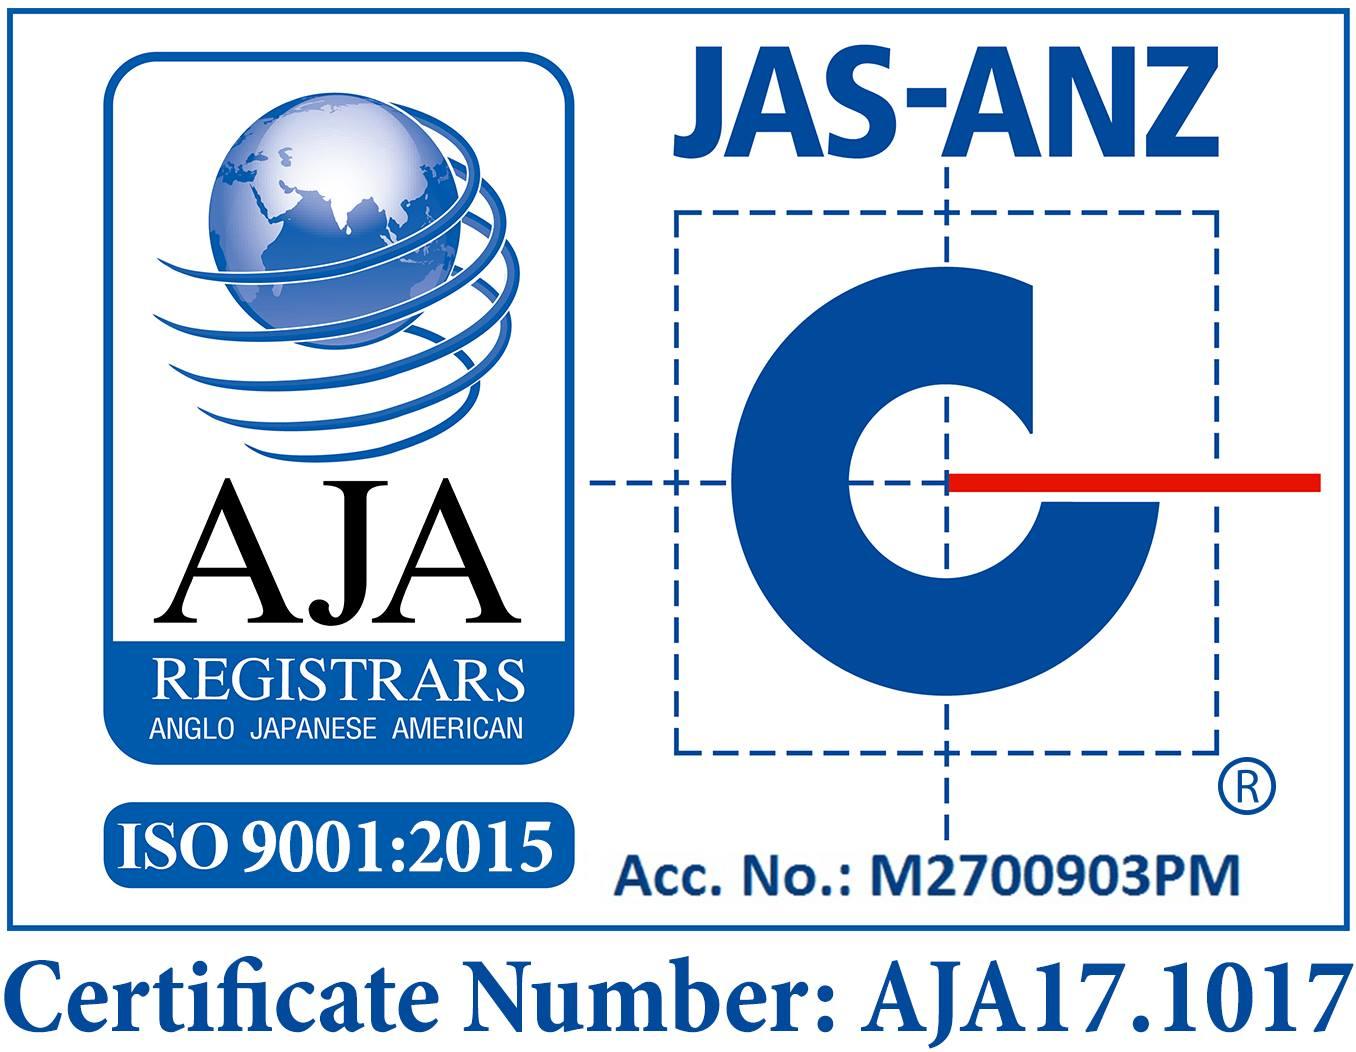 ISO 9001:2015 Surveillance Audit